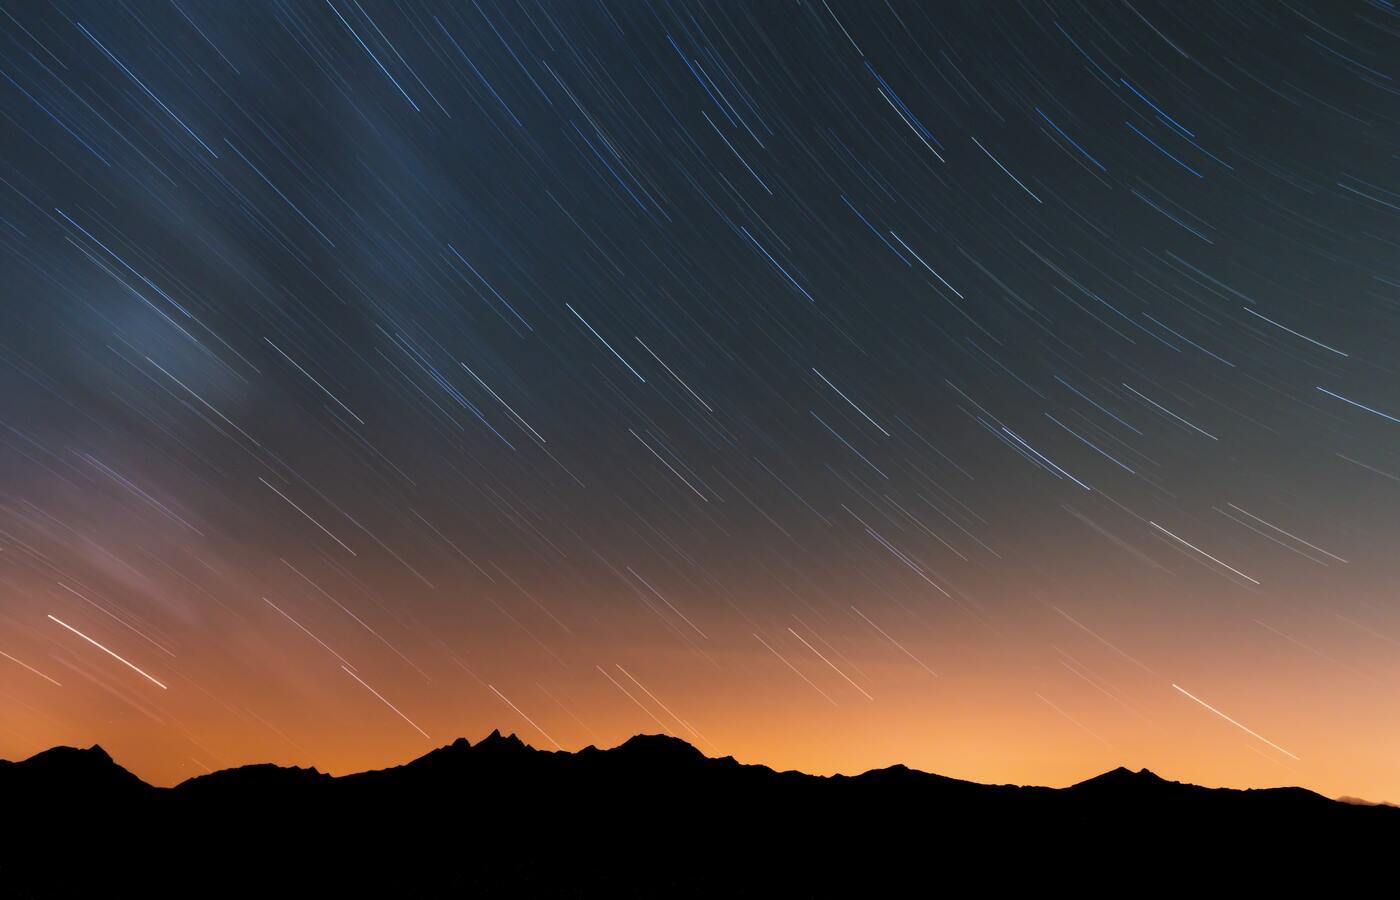 rain-of-stars-over-swiss-alps-5k-we.jpg